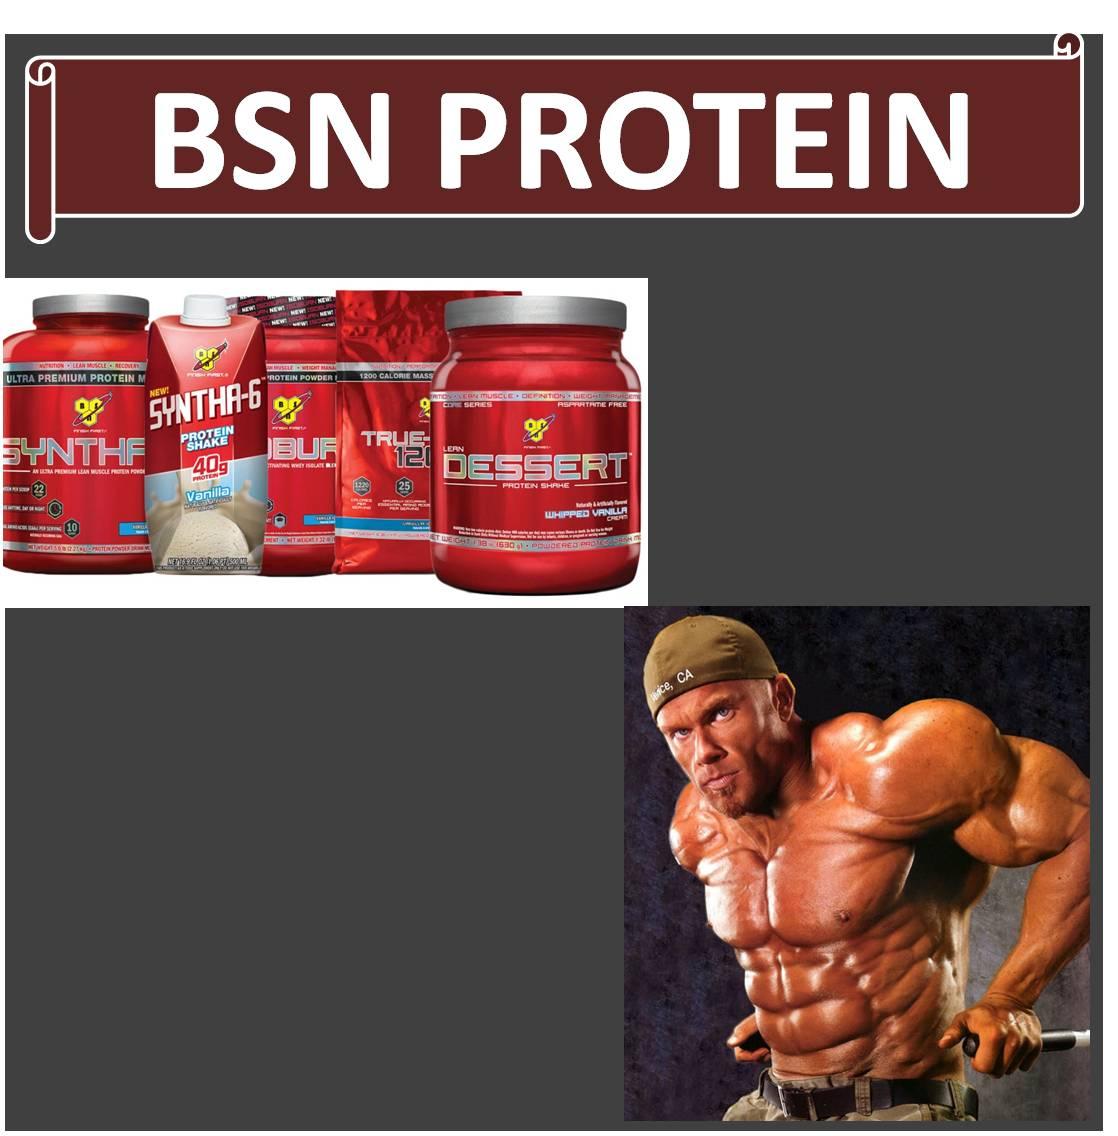 BSN Protein